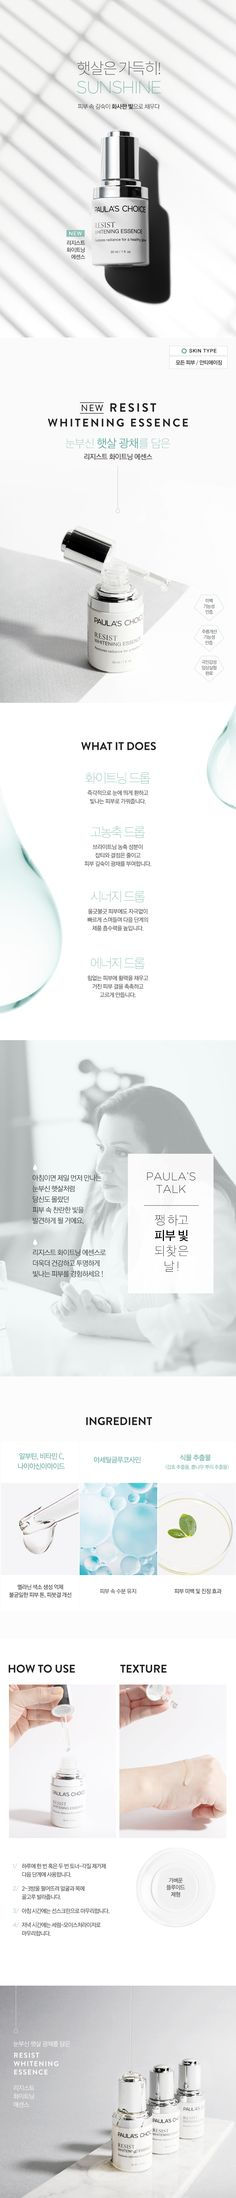 Web design layout cosmetics page paulaschoice essence skincare 폴라초이스 웹디자인 제품 상세페이지 화장품 화이트닝 스킨케어 에센스 BY.CHLOE SEUL